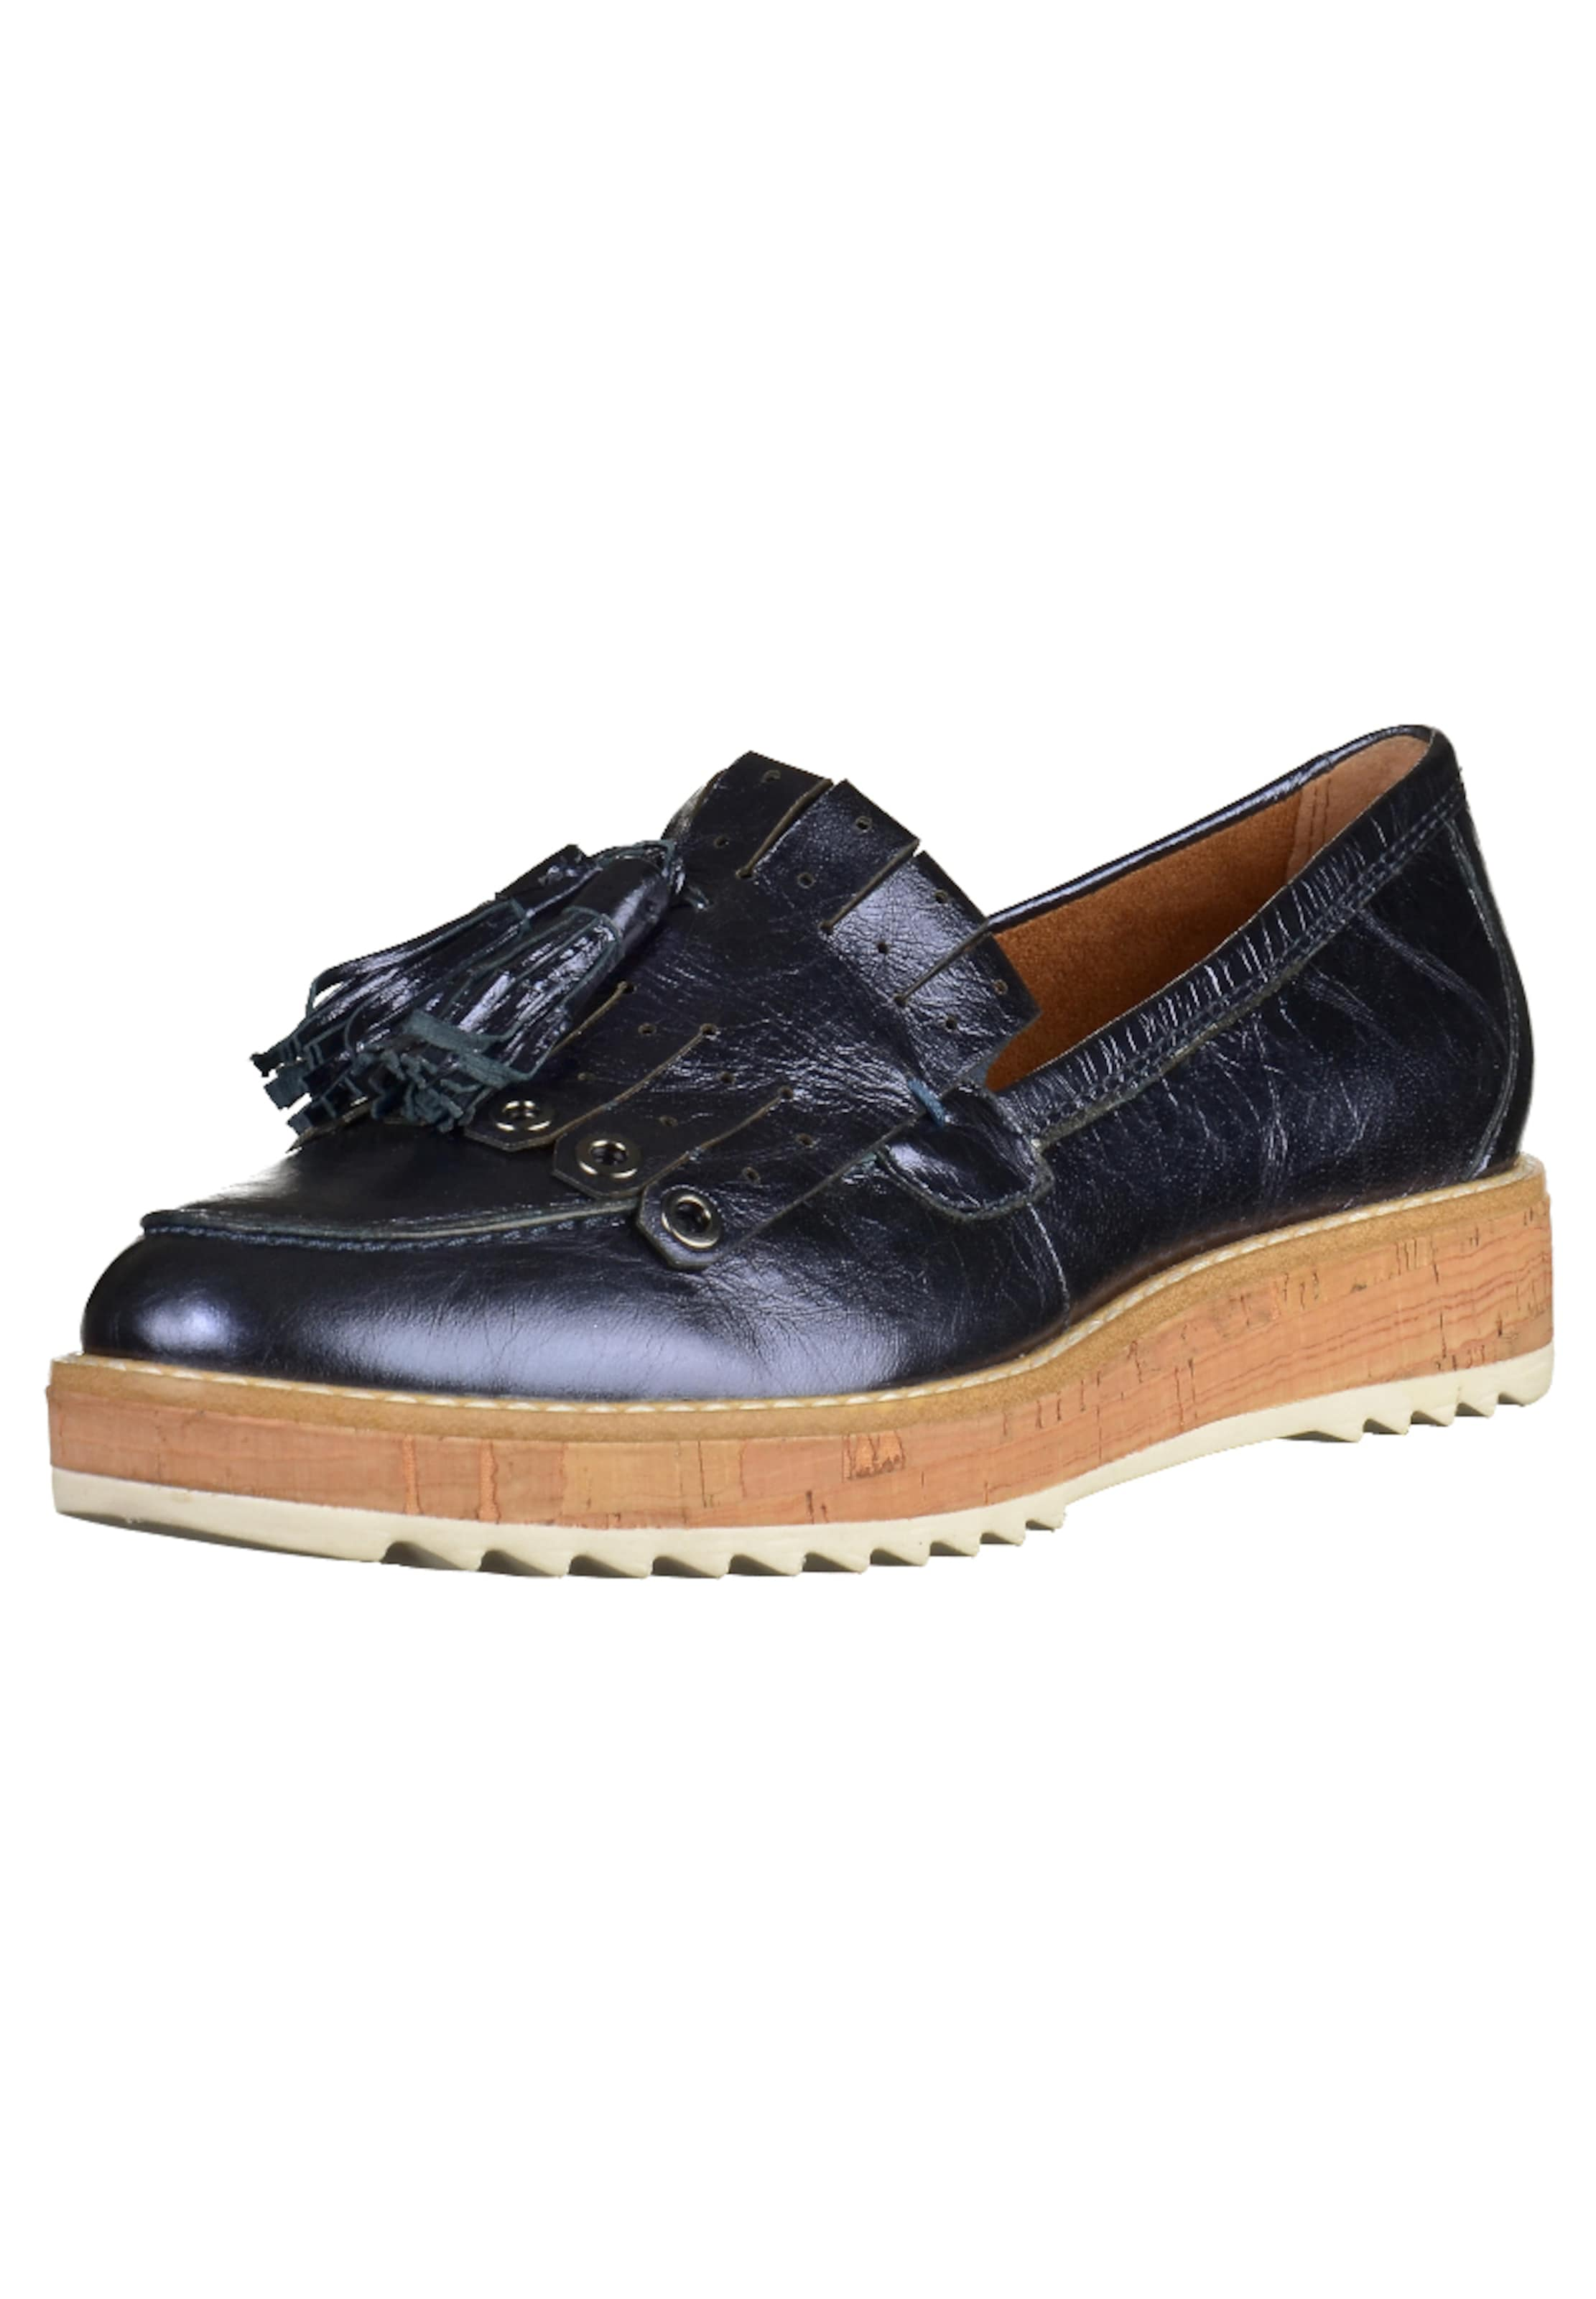 TAMARIS Metallic Plateau-Slipper Verschleißfeste billige Schuhe